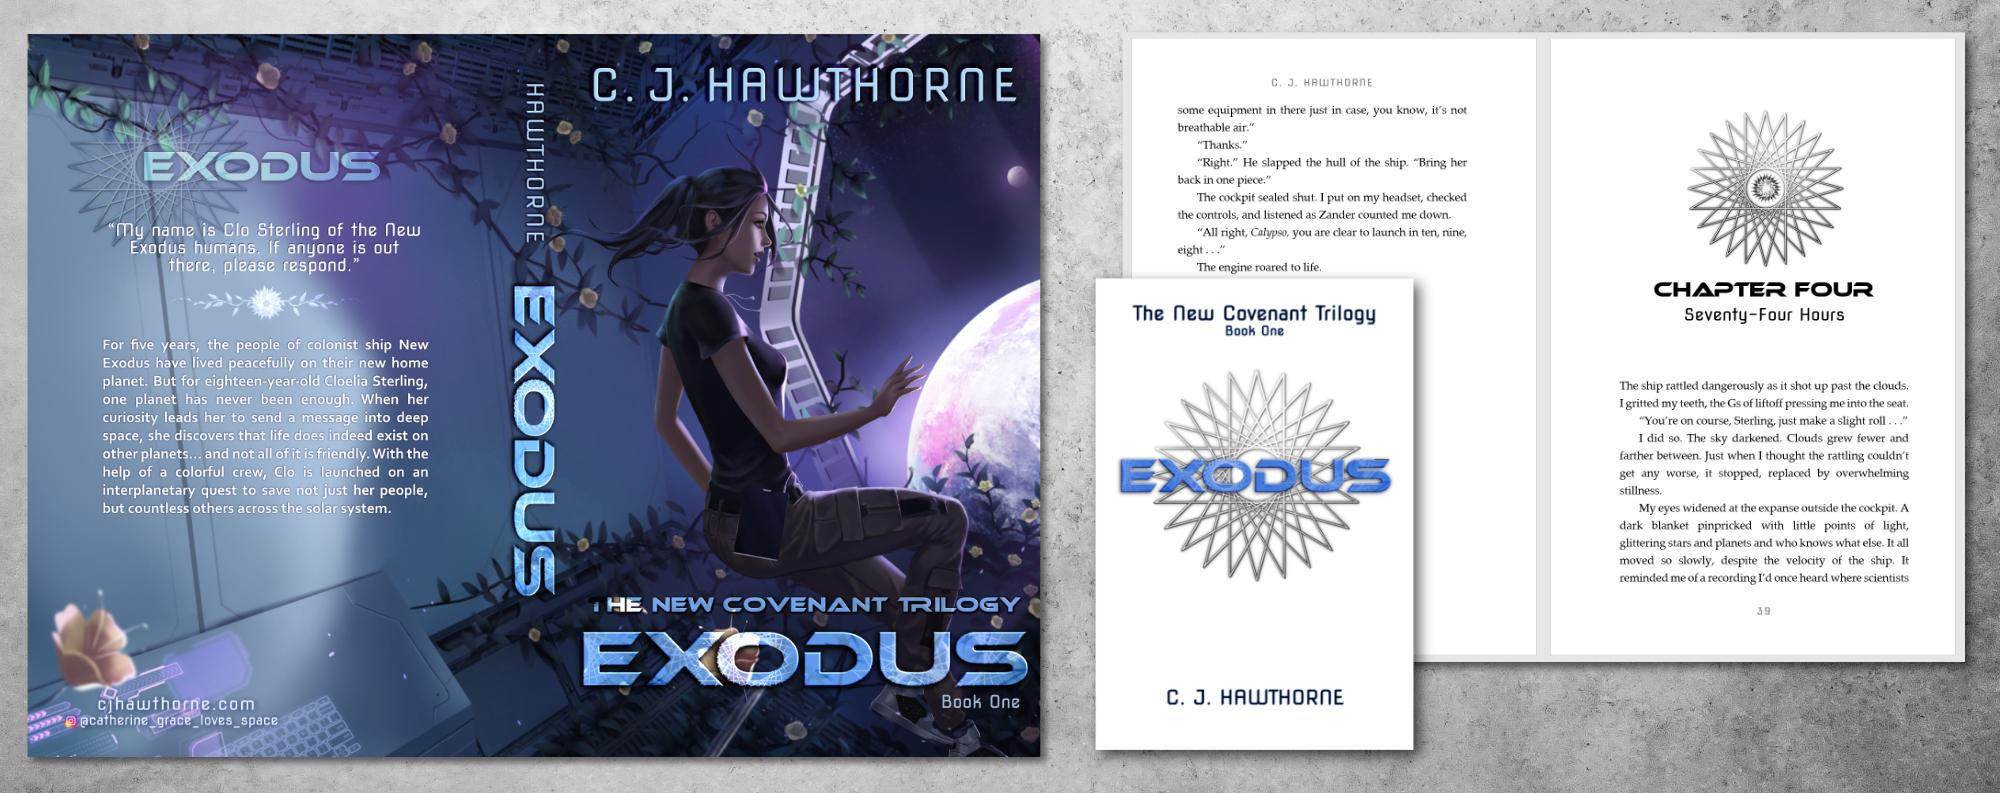 Example image of book Exodus by C. J. Hawthorne